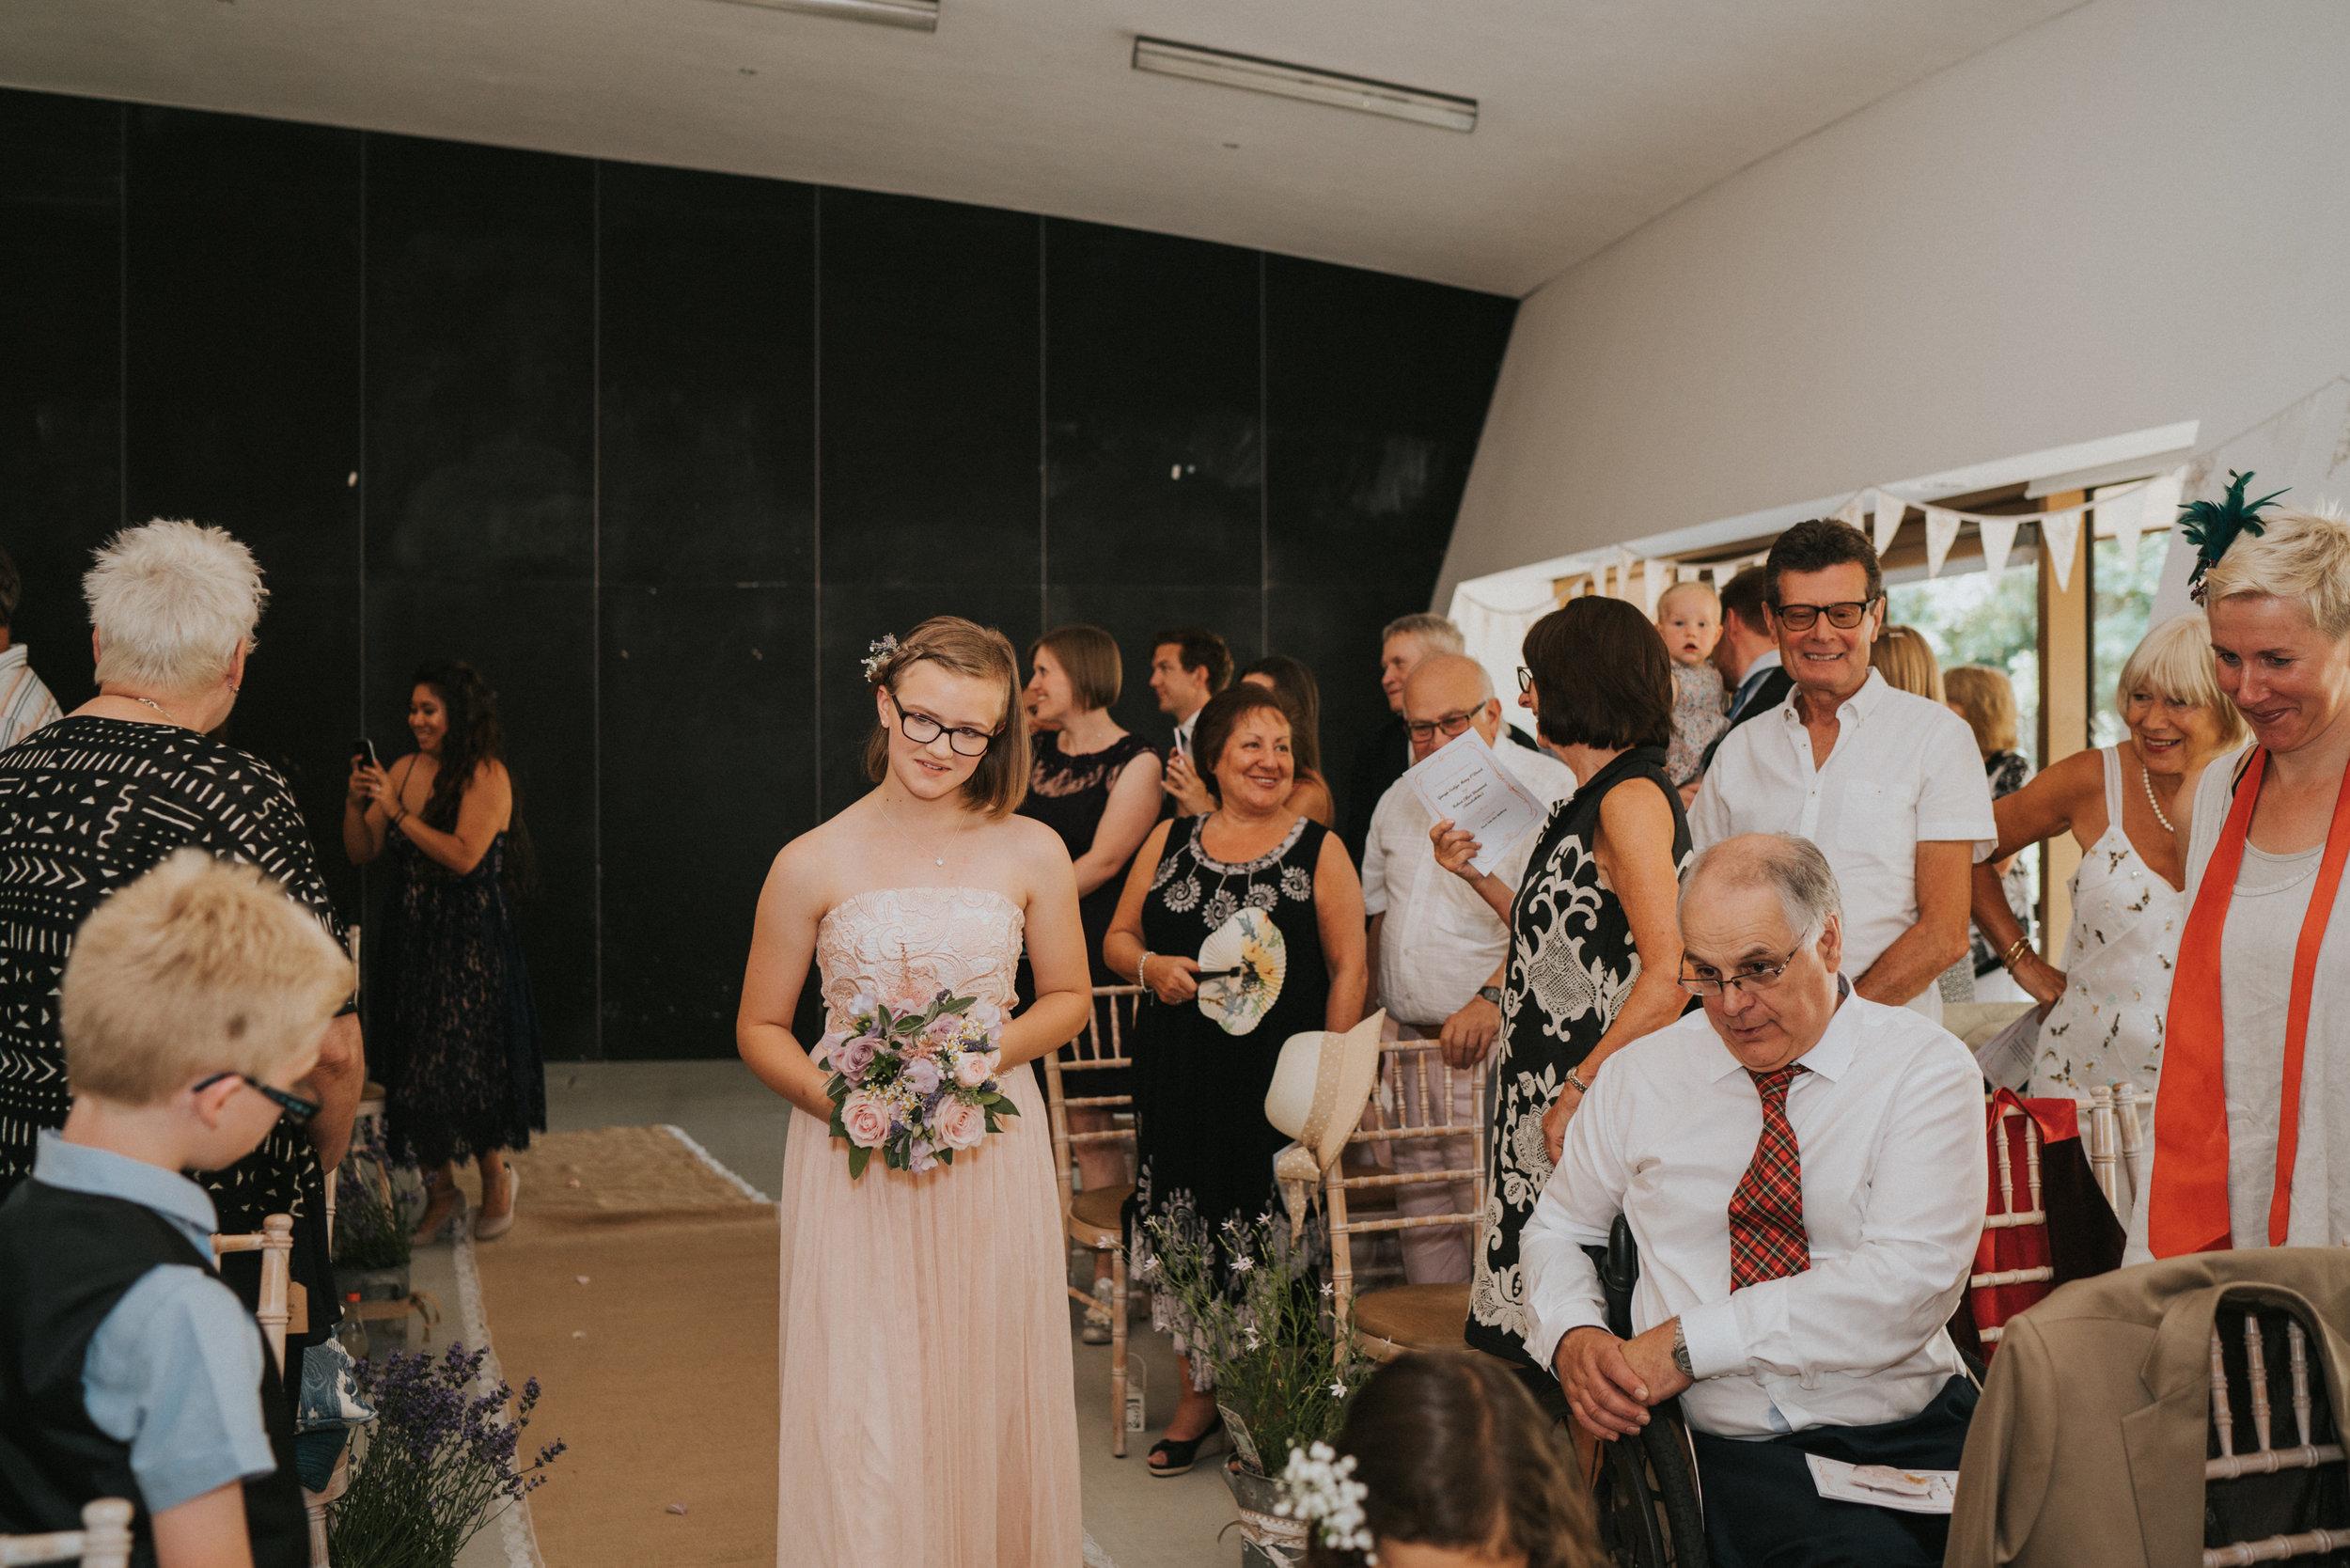 Grace-Elizabeth-Georgie-Amalaketu-Firstsite-Colchester-Essex-Boho-Buddhist-Wedding-Alternative-Wedding-Photography-Essex (38 of 100).jpg